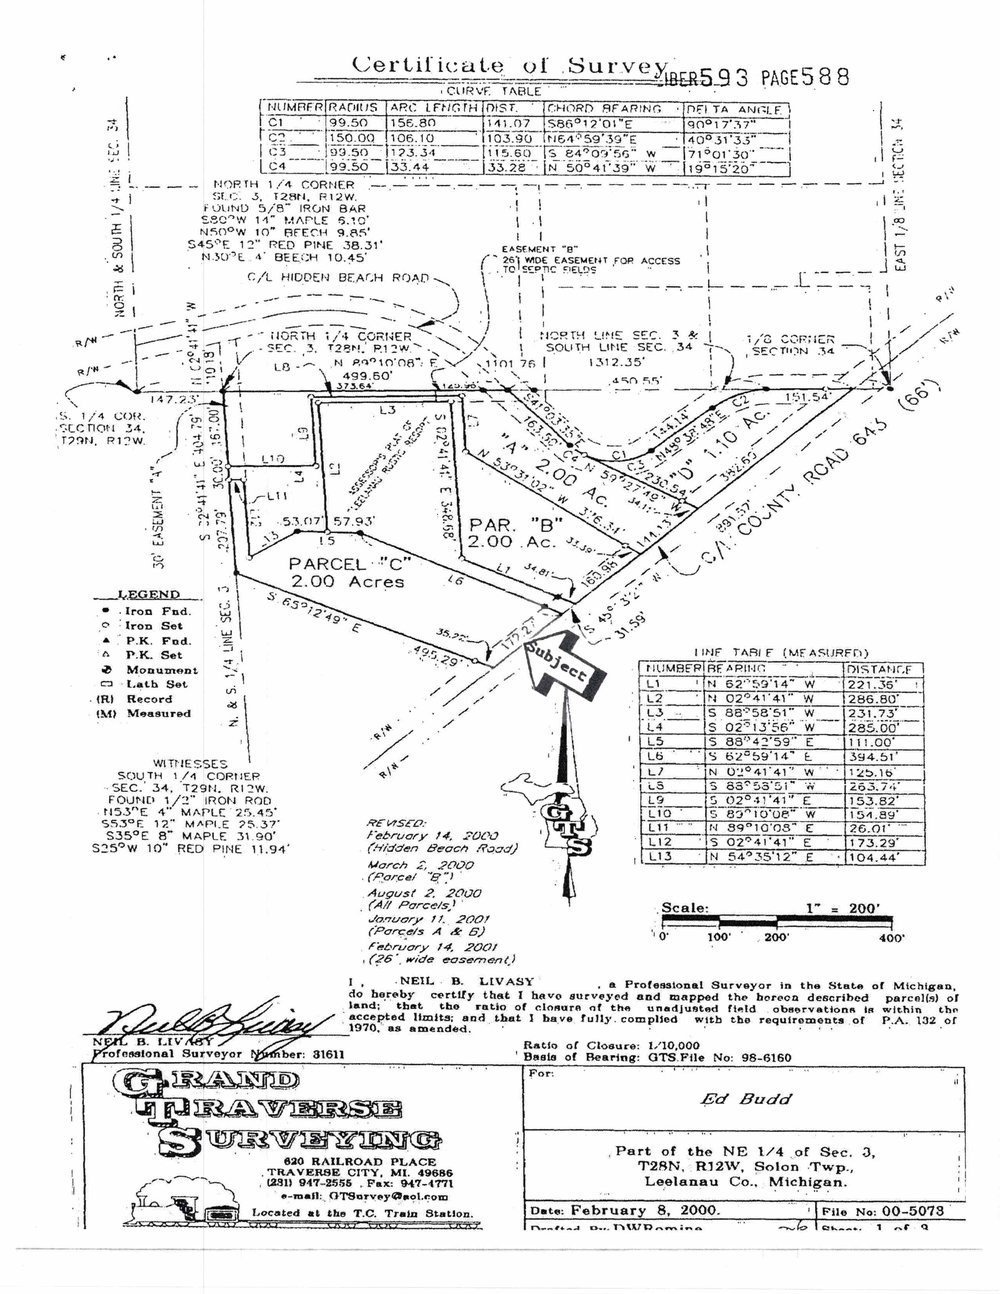 5500 E Hidden Beech, Cedar, MI - For sale by Oltersdorf Realty LLC - Marketing Packet (22).jpg